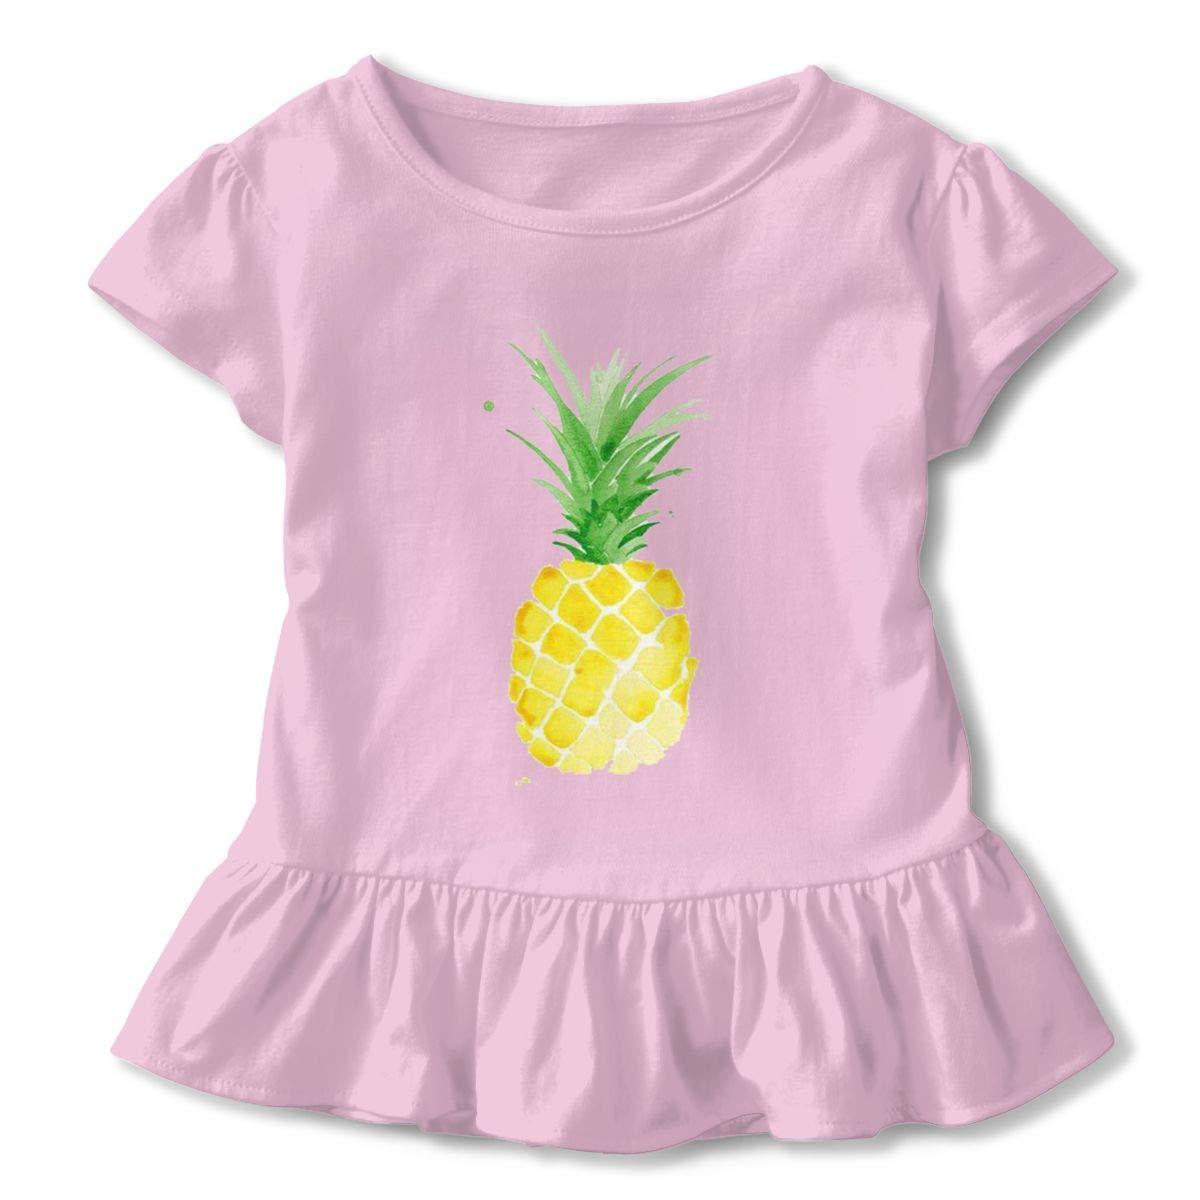 Happy-girl Ye Pineapple Outdoor Lover Short-Sleeve Tunic T-Shirt